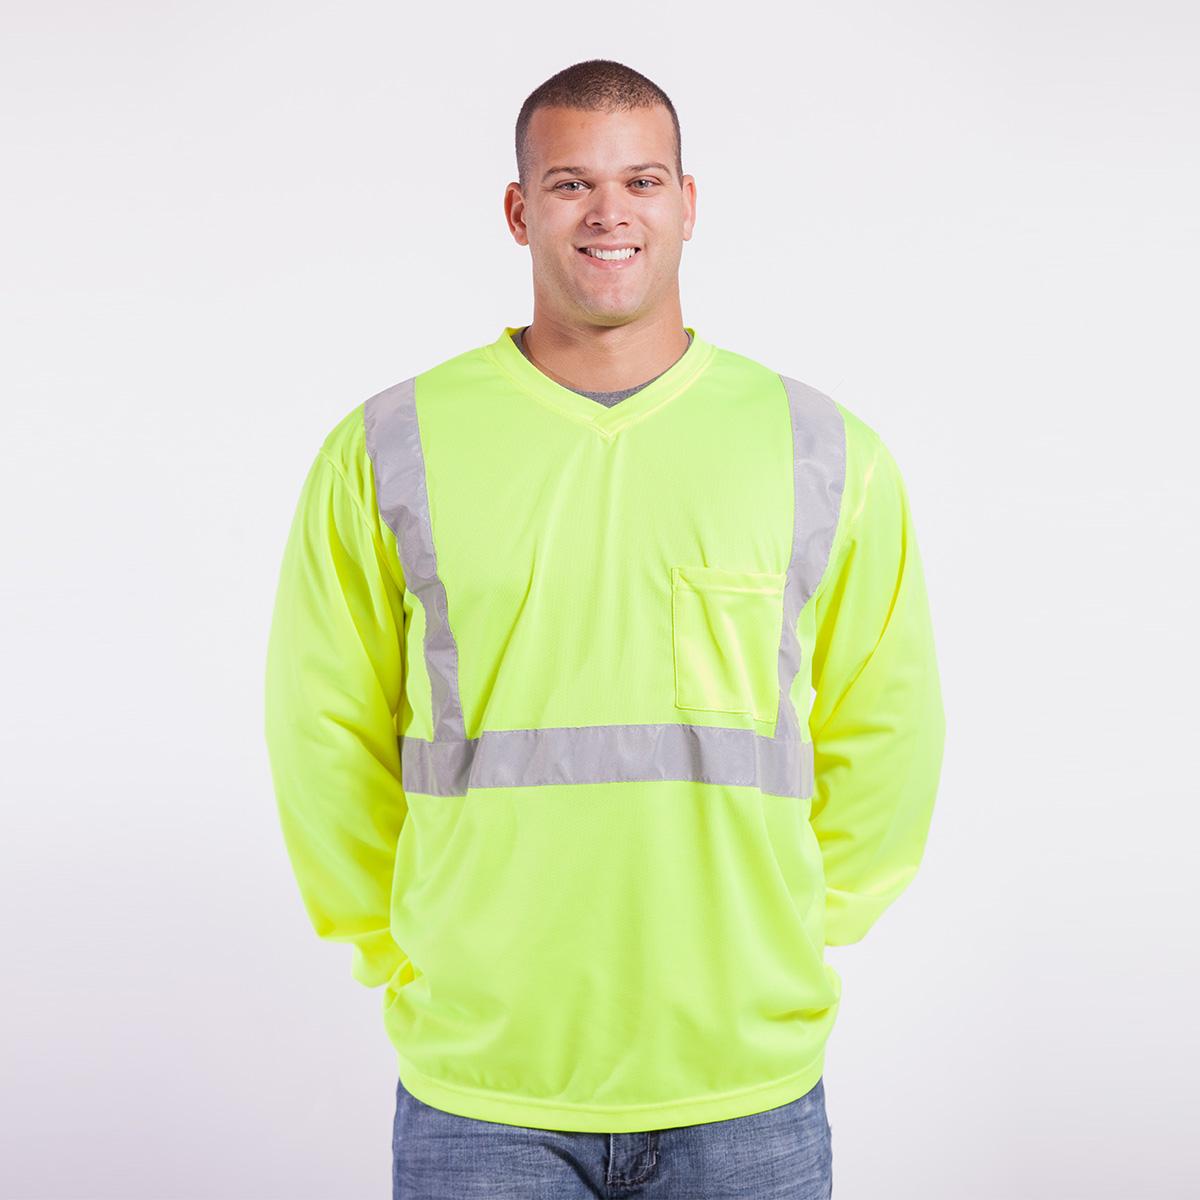 Class-ii-Shirt-Long-Sleeve-Performance-Fabric-yellow-front